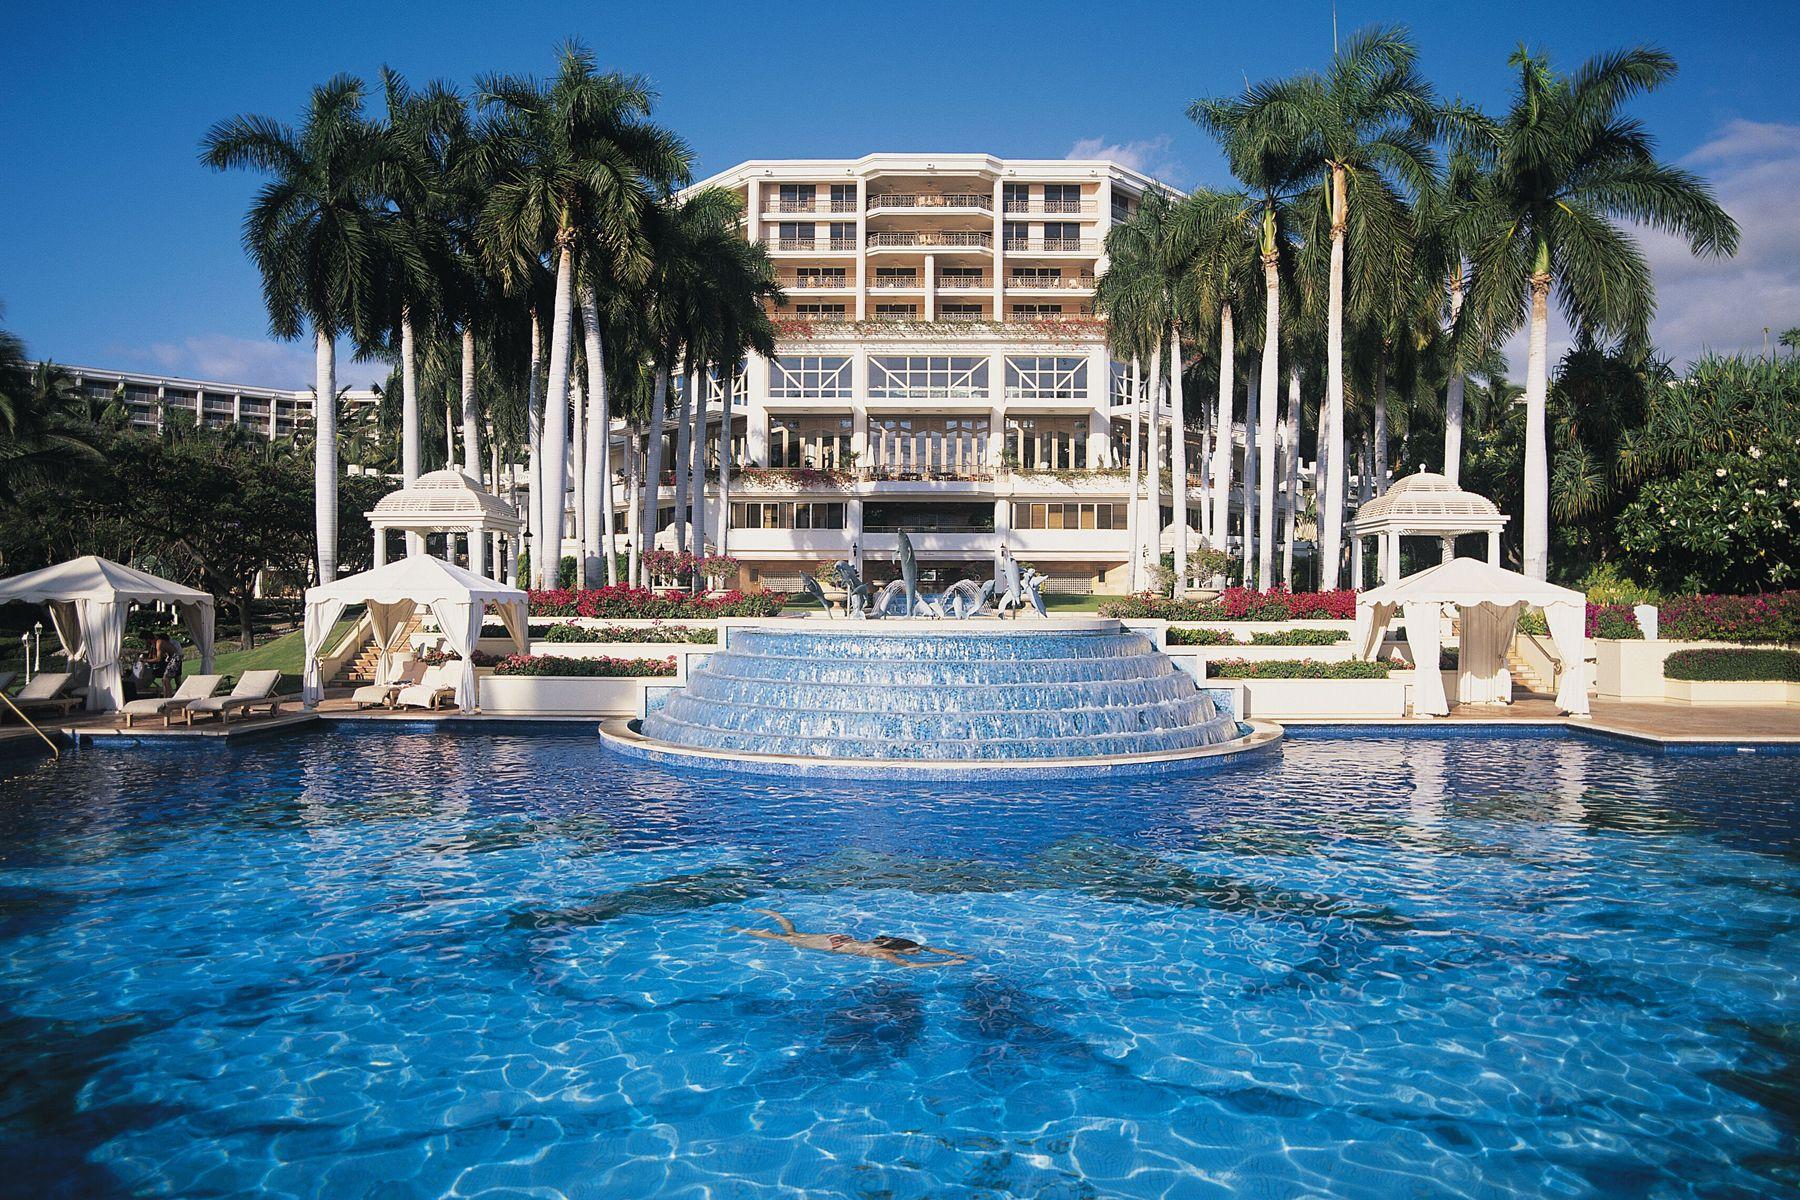 grand wailea resort hawaii- massive pool with waterslide, water